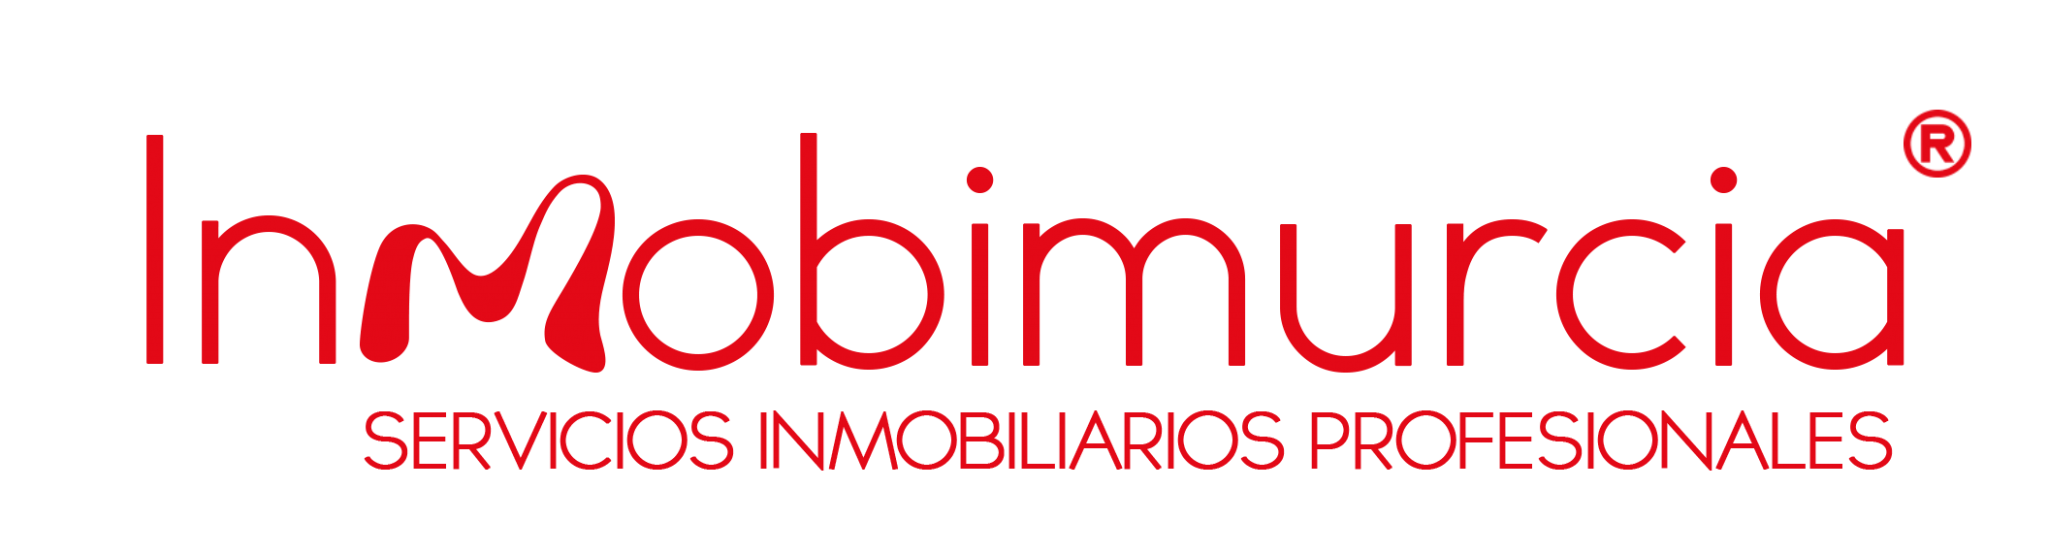 Jose Angel Olmos Inmobimurcia -Inmobiliaria-Patiño - Inmobiliaria Santo Angel